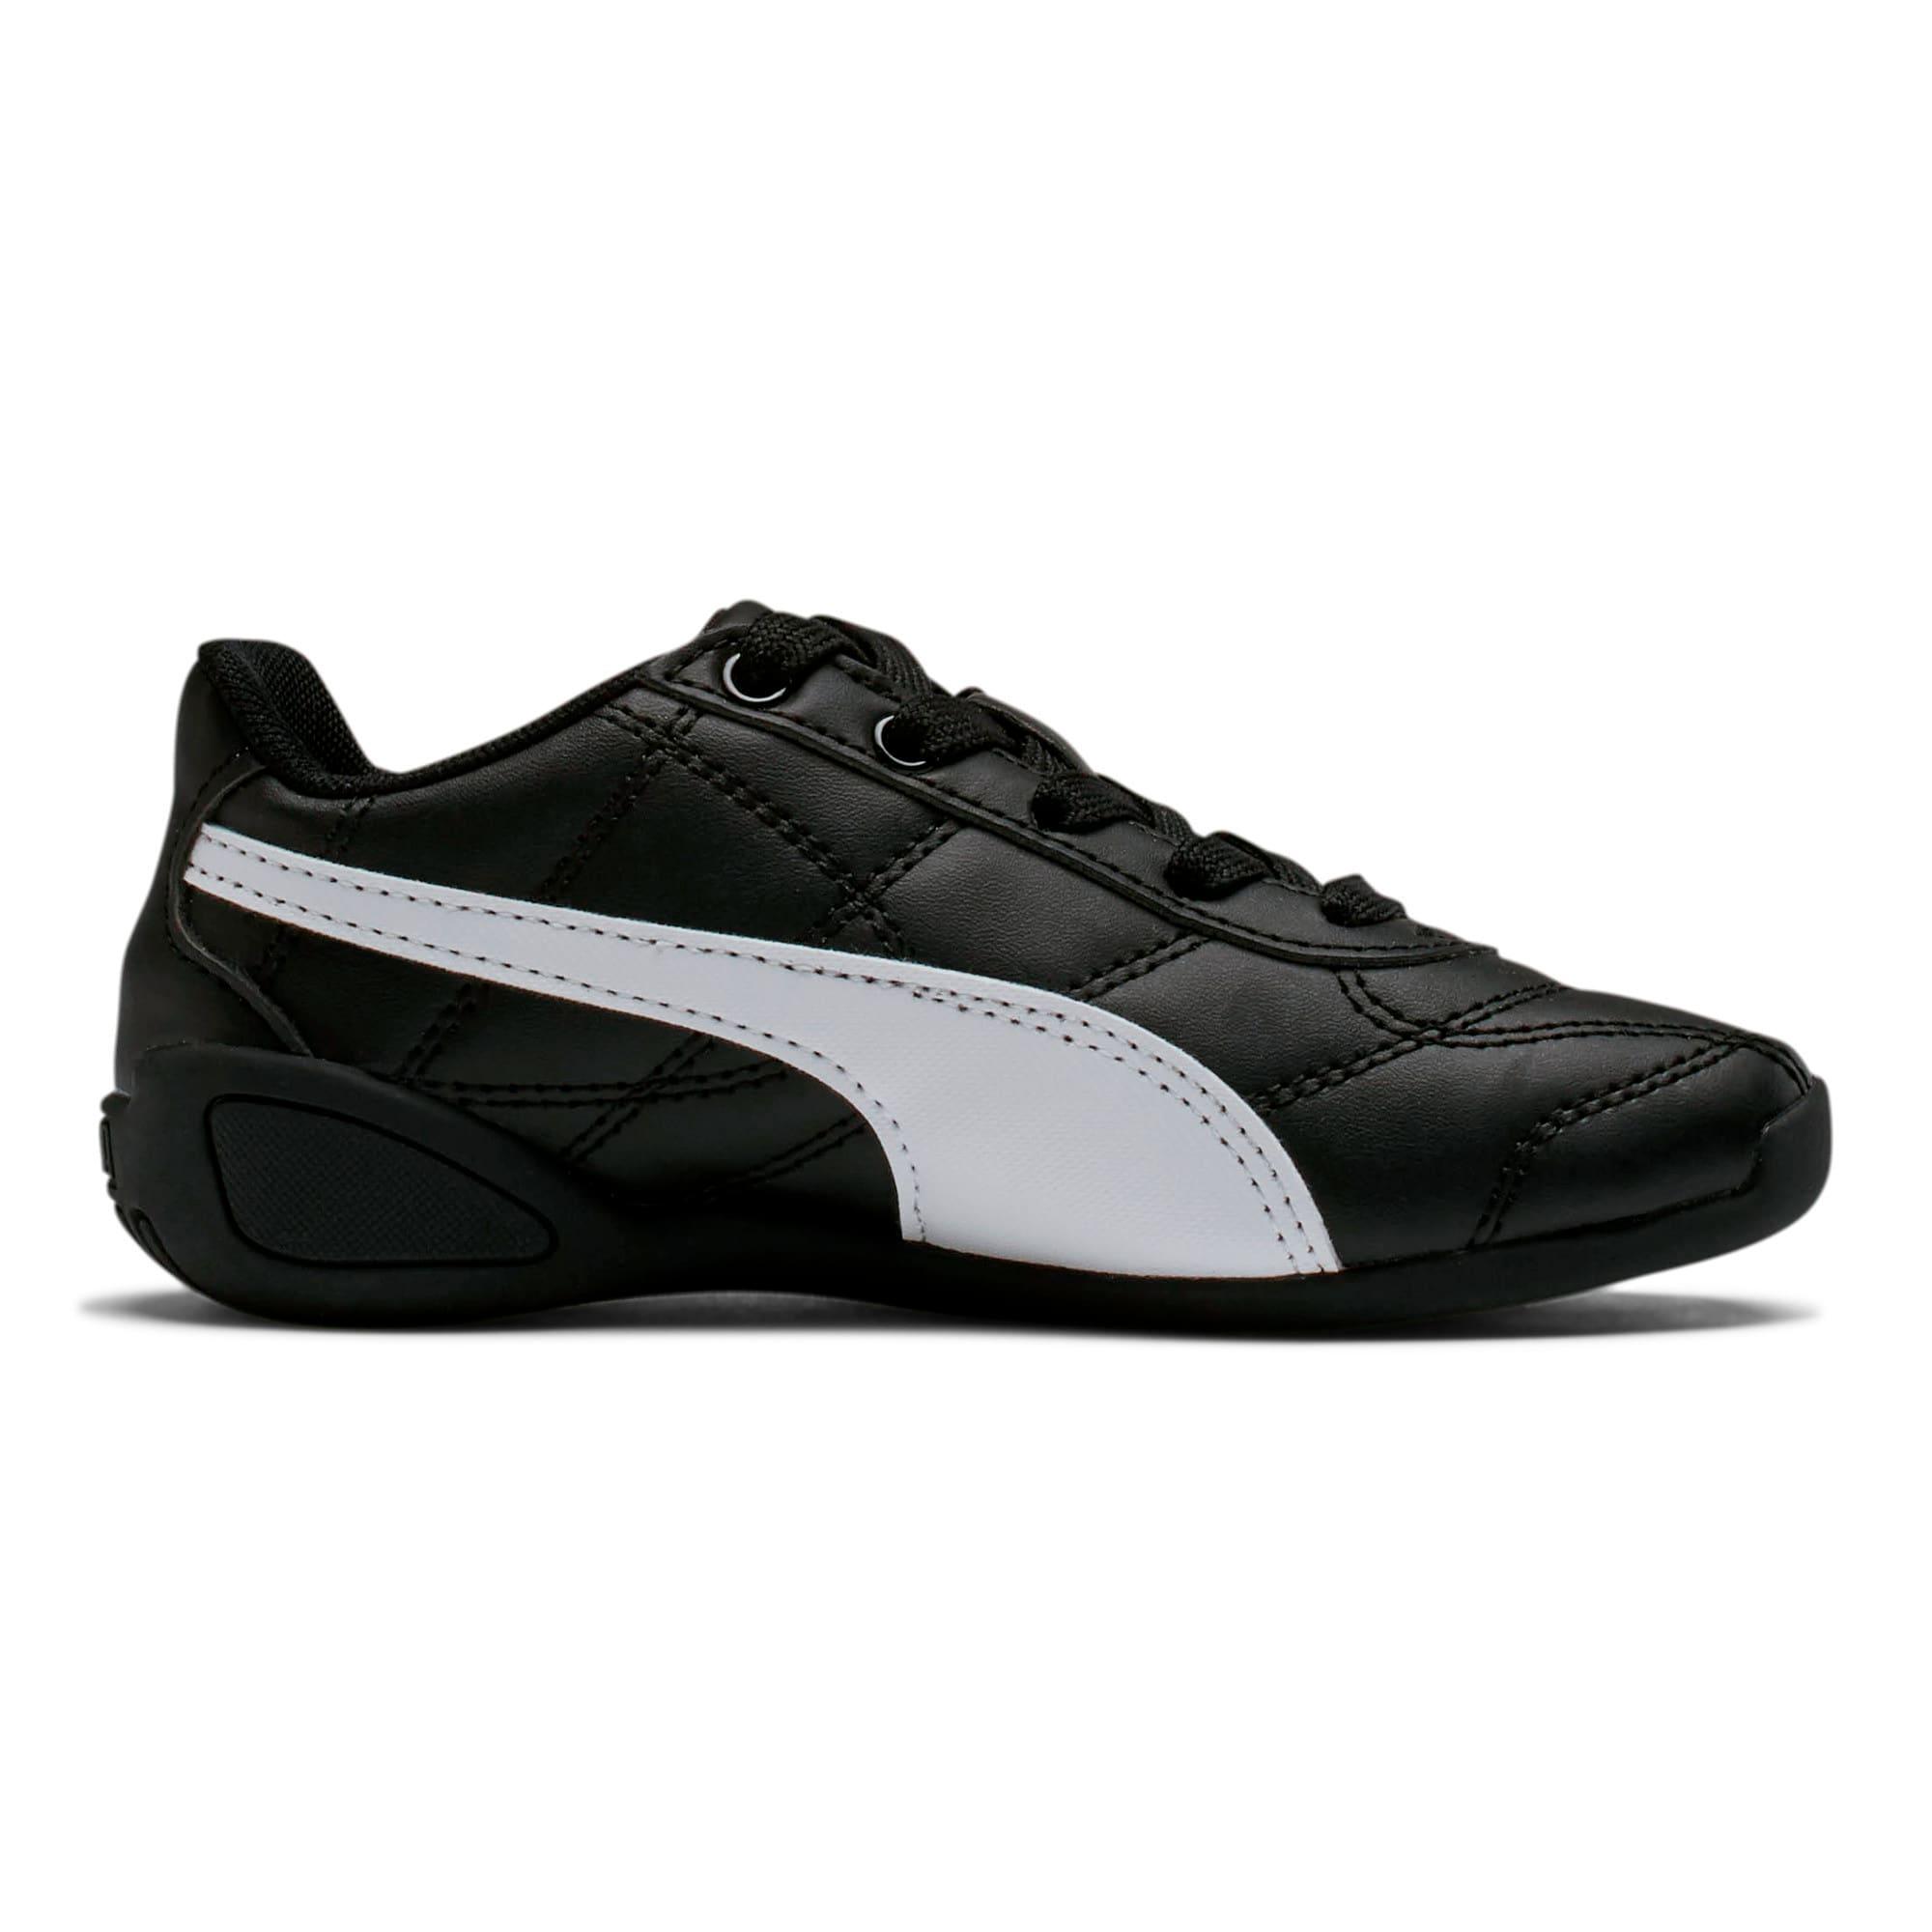 Thumbnail 5 of Tune Cat 3 Little Kids' Shoes, Puma Black-Puma White, medium